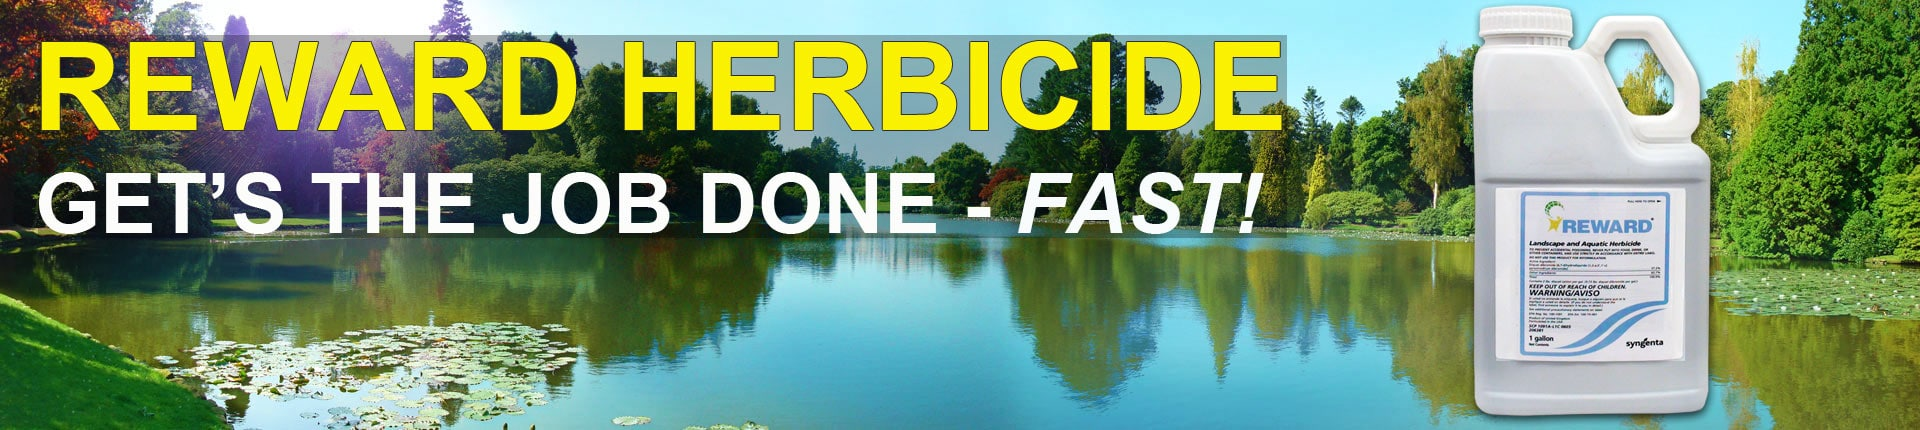 Reward Herbicide - Aquatic Weed and Algae Control with 37% Diquat